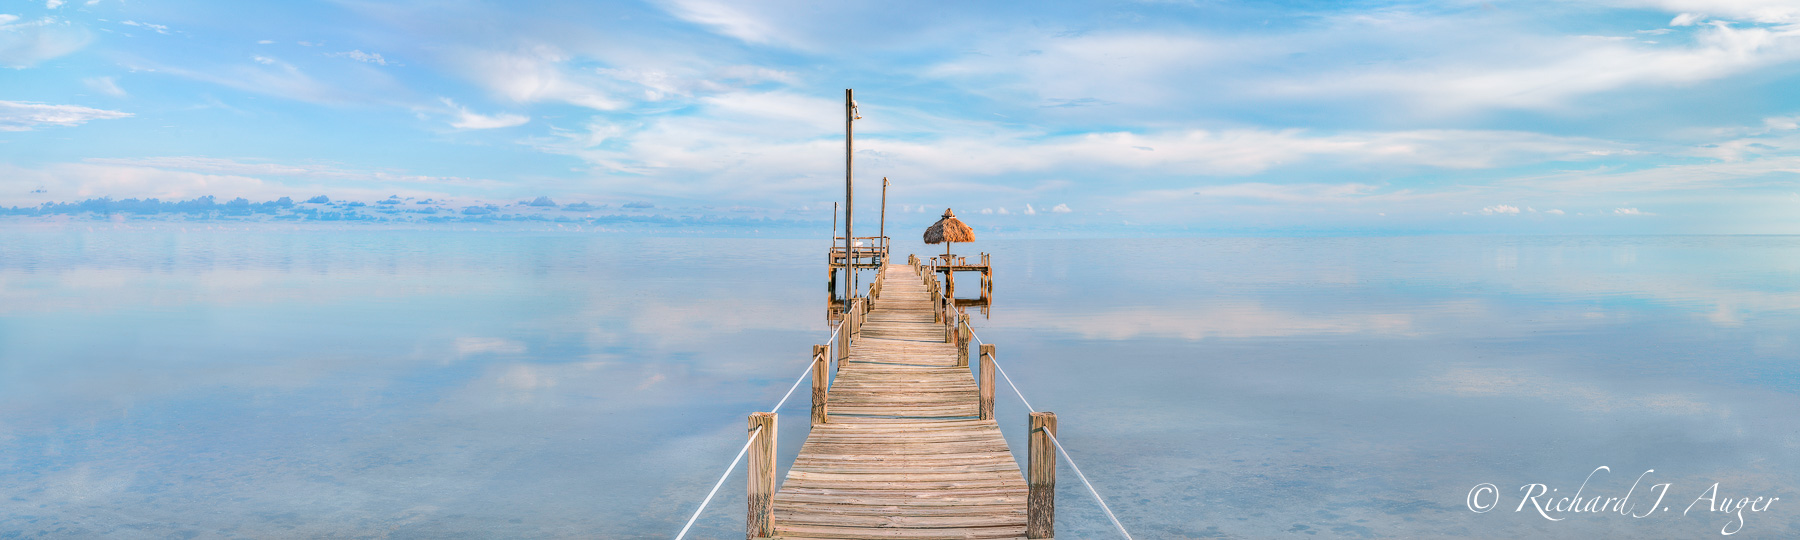 dock, Florida Keys, Islamorada, blue, panorama, photographer, photography